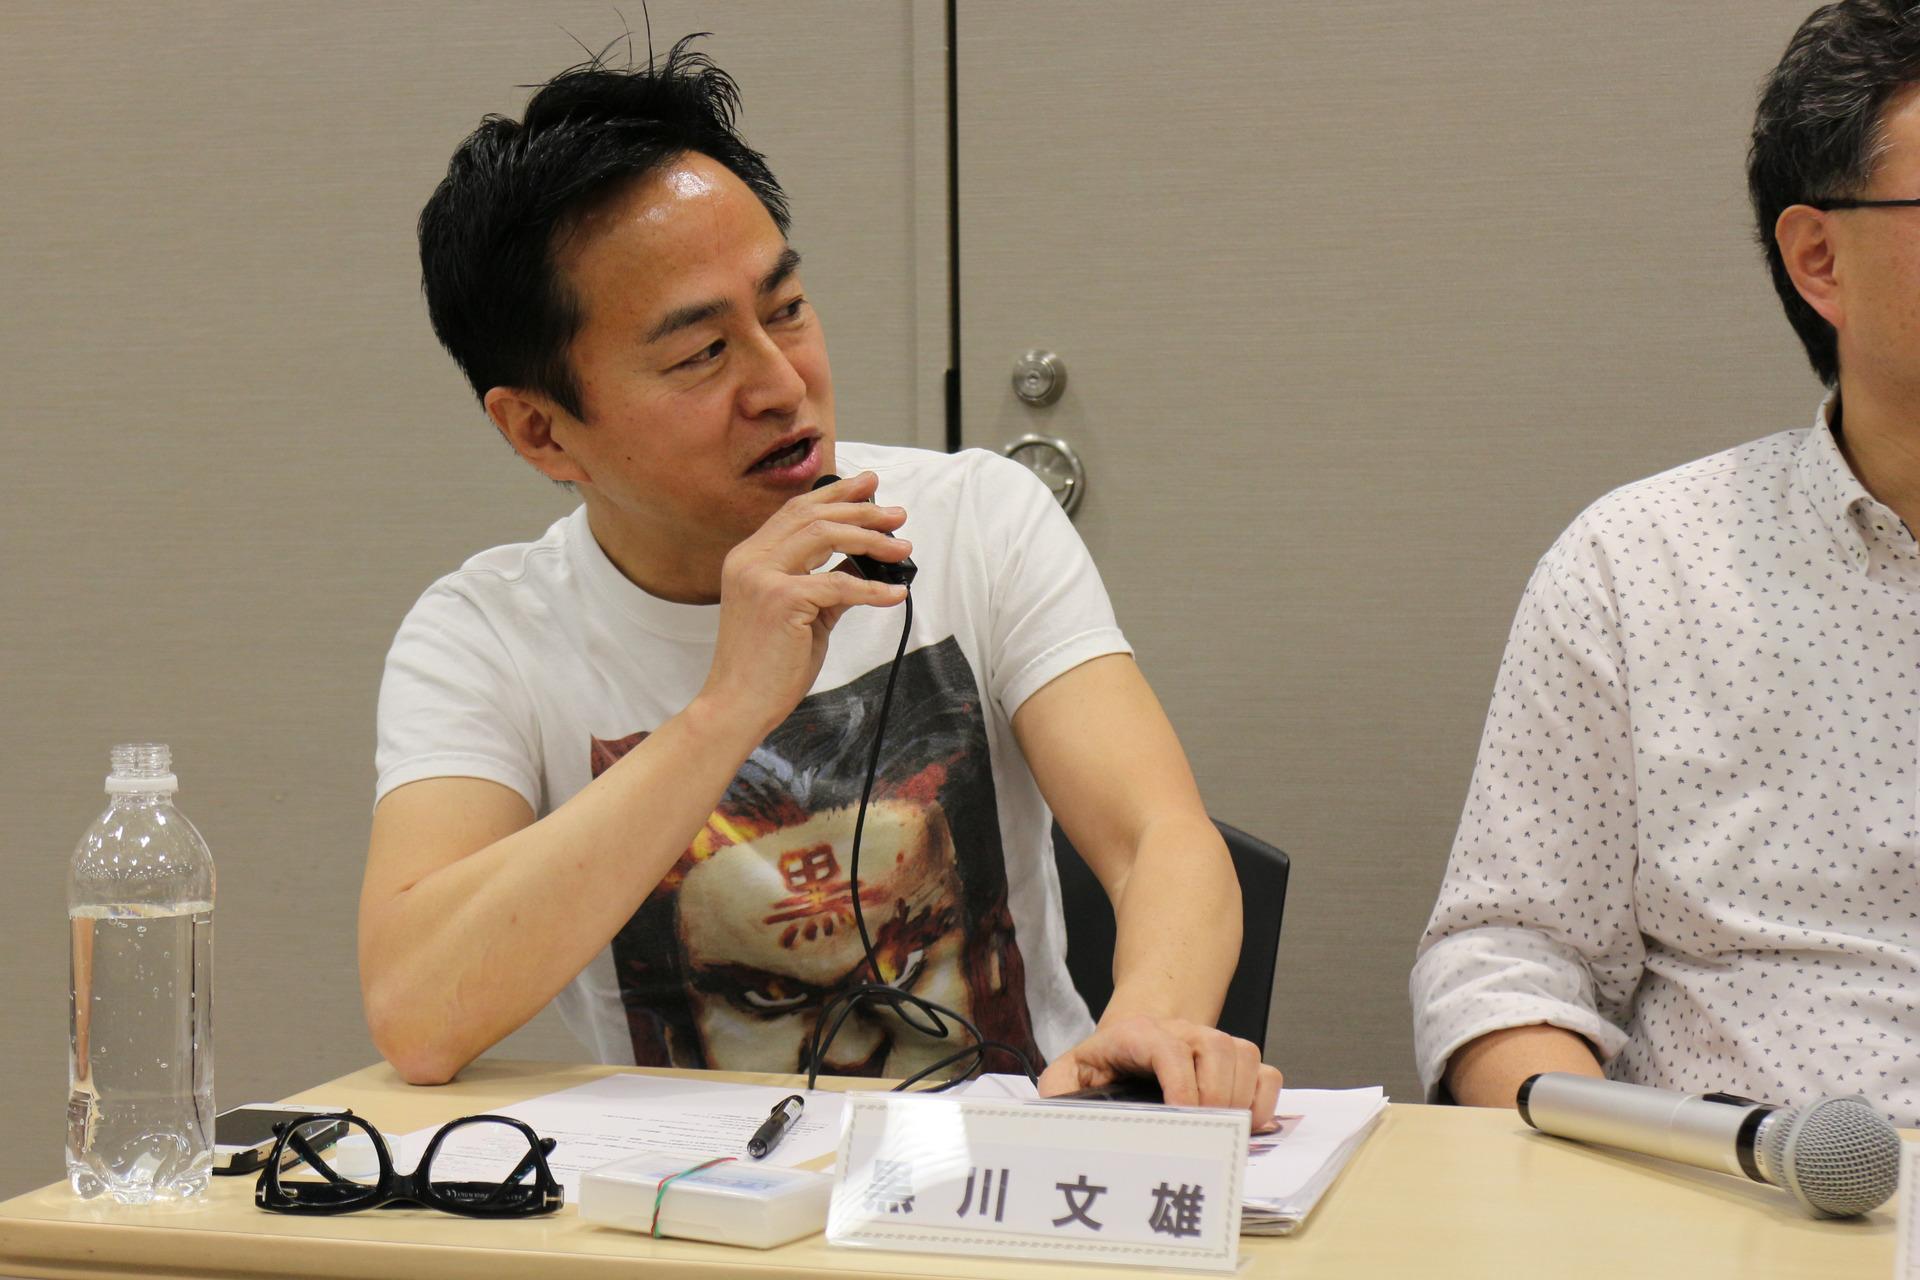 VRの普及に向けた質問をぶつける黒川氏